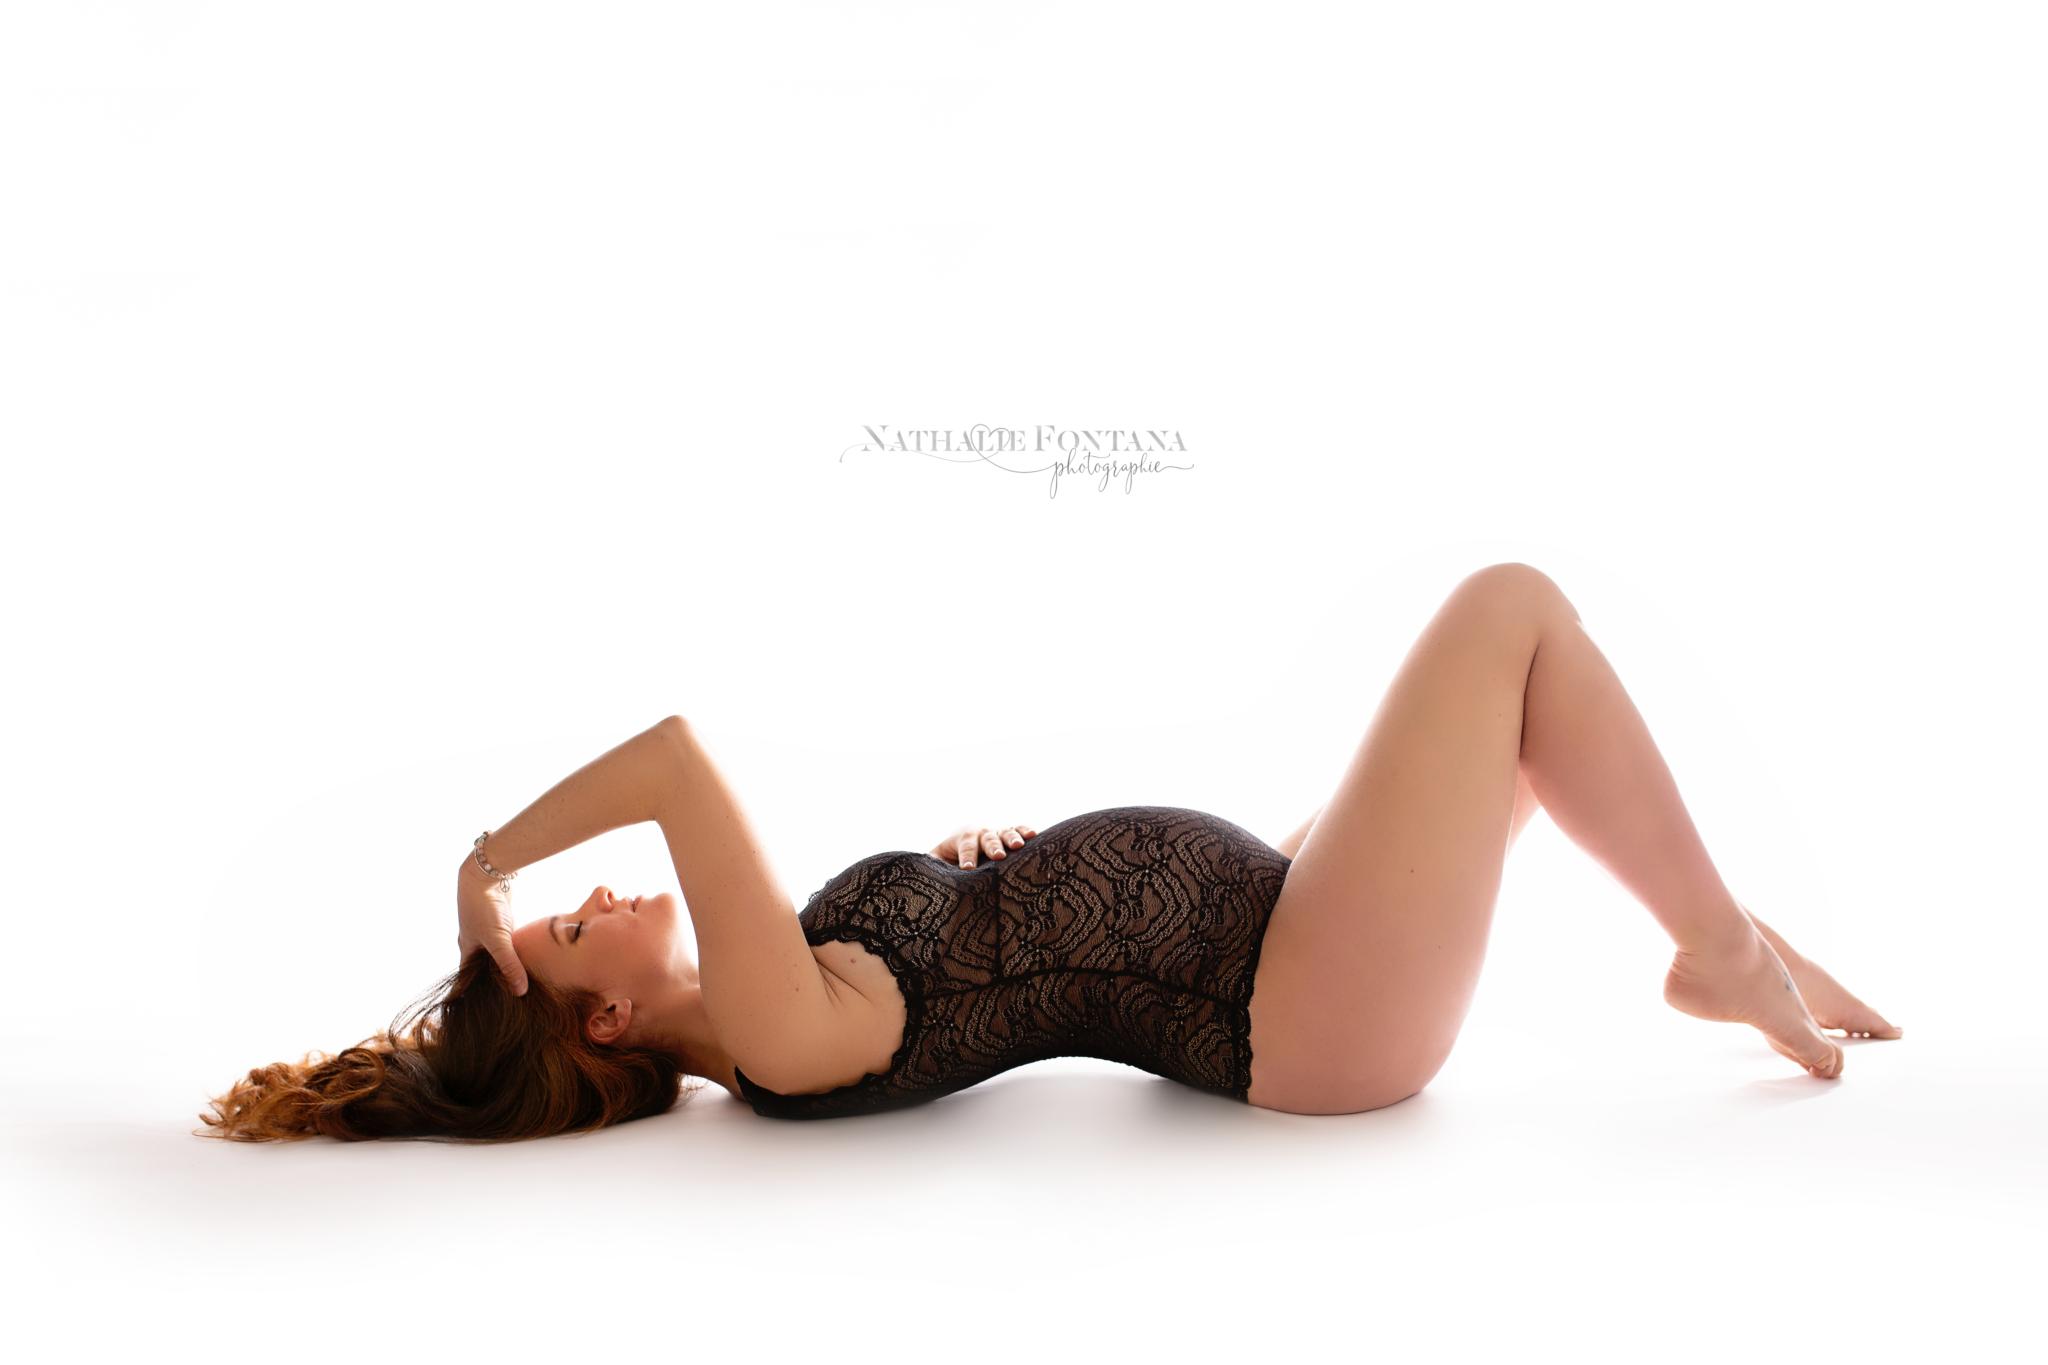 Nathalie Fontana, photographe grossesse Genève et alentours